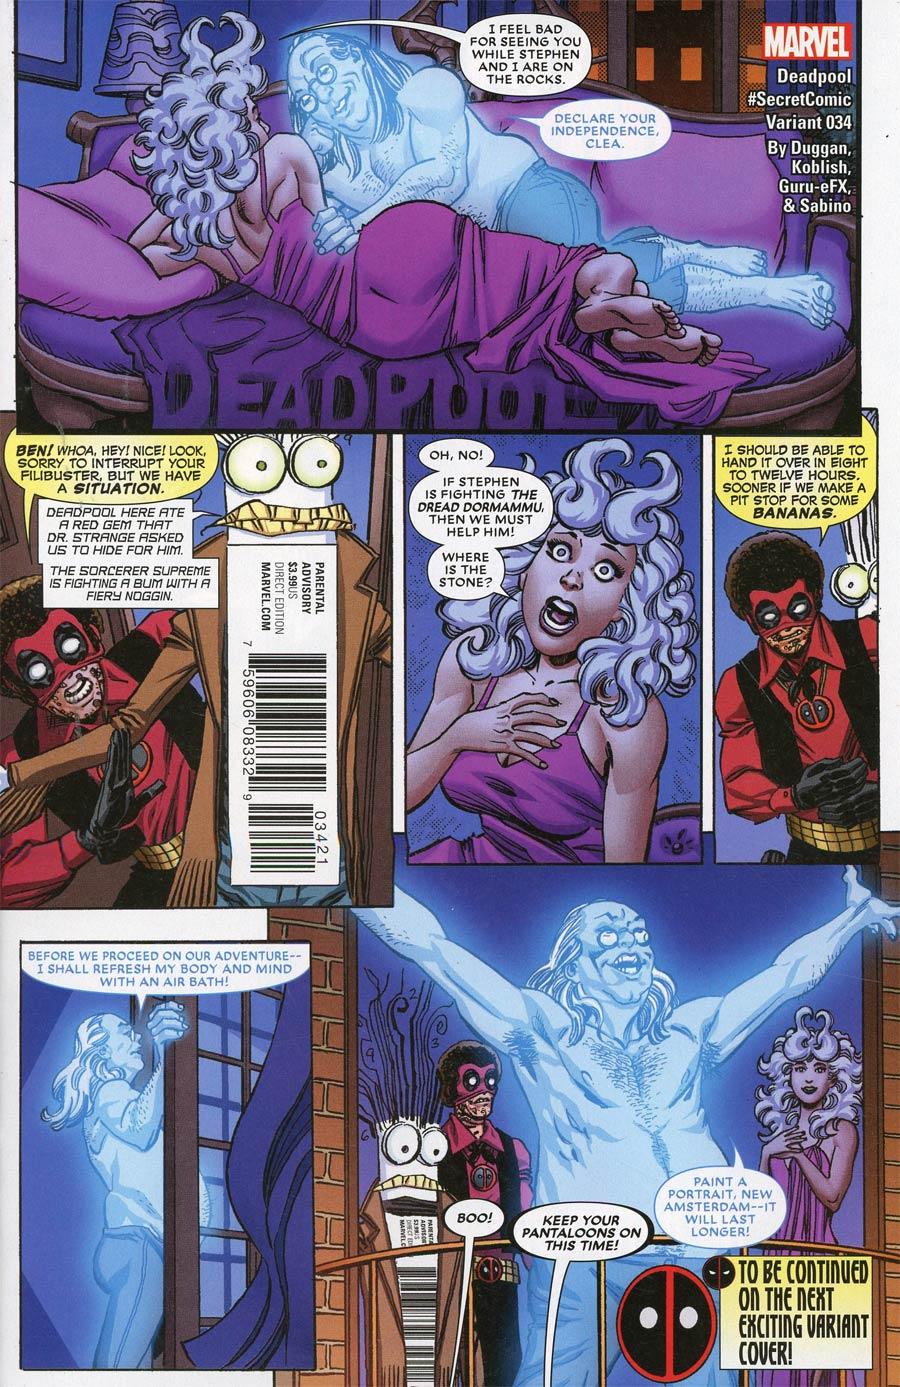 Deadpool Vol 5 #34 Cover B Variant Scott Koblish Secret Comics Cover (Secret Empire Tie-In)